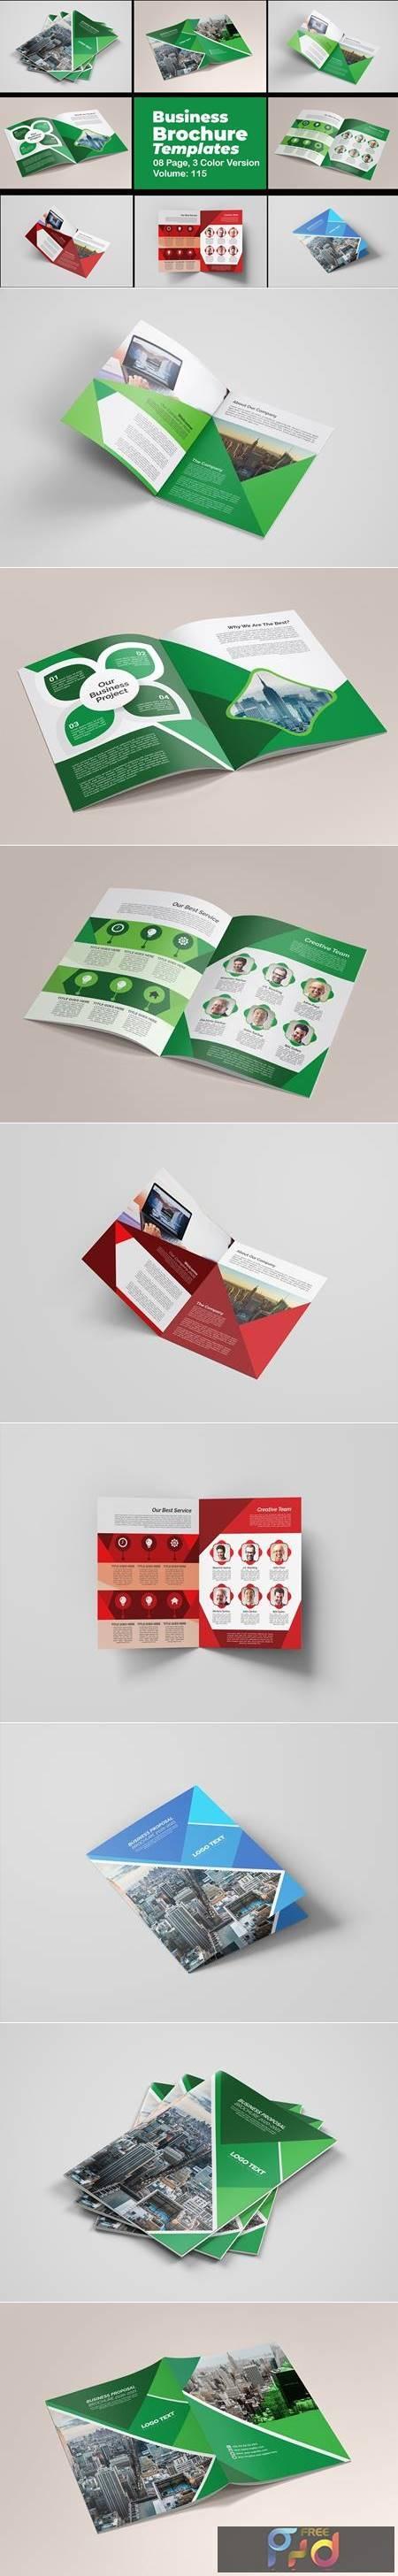 Business Proposal Brochure 4621739 1